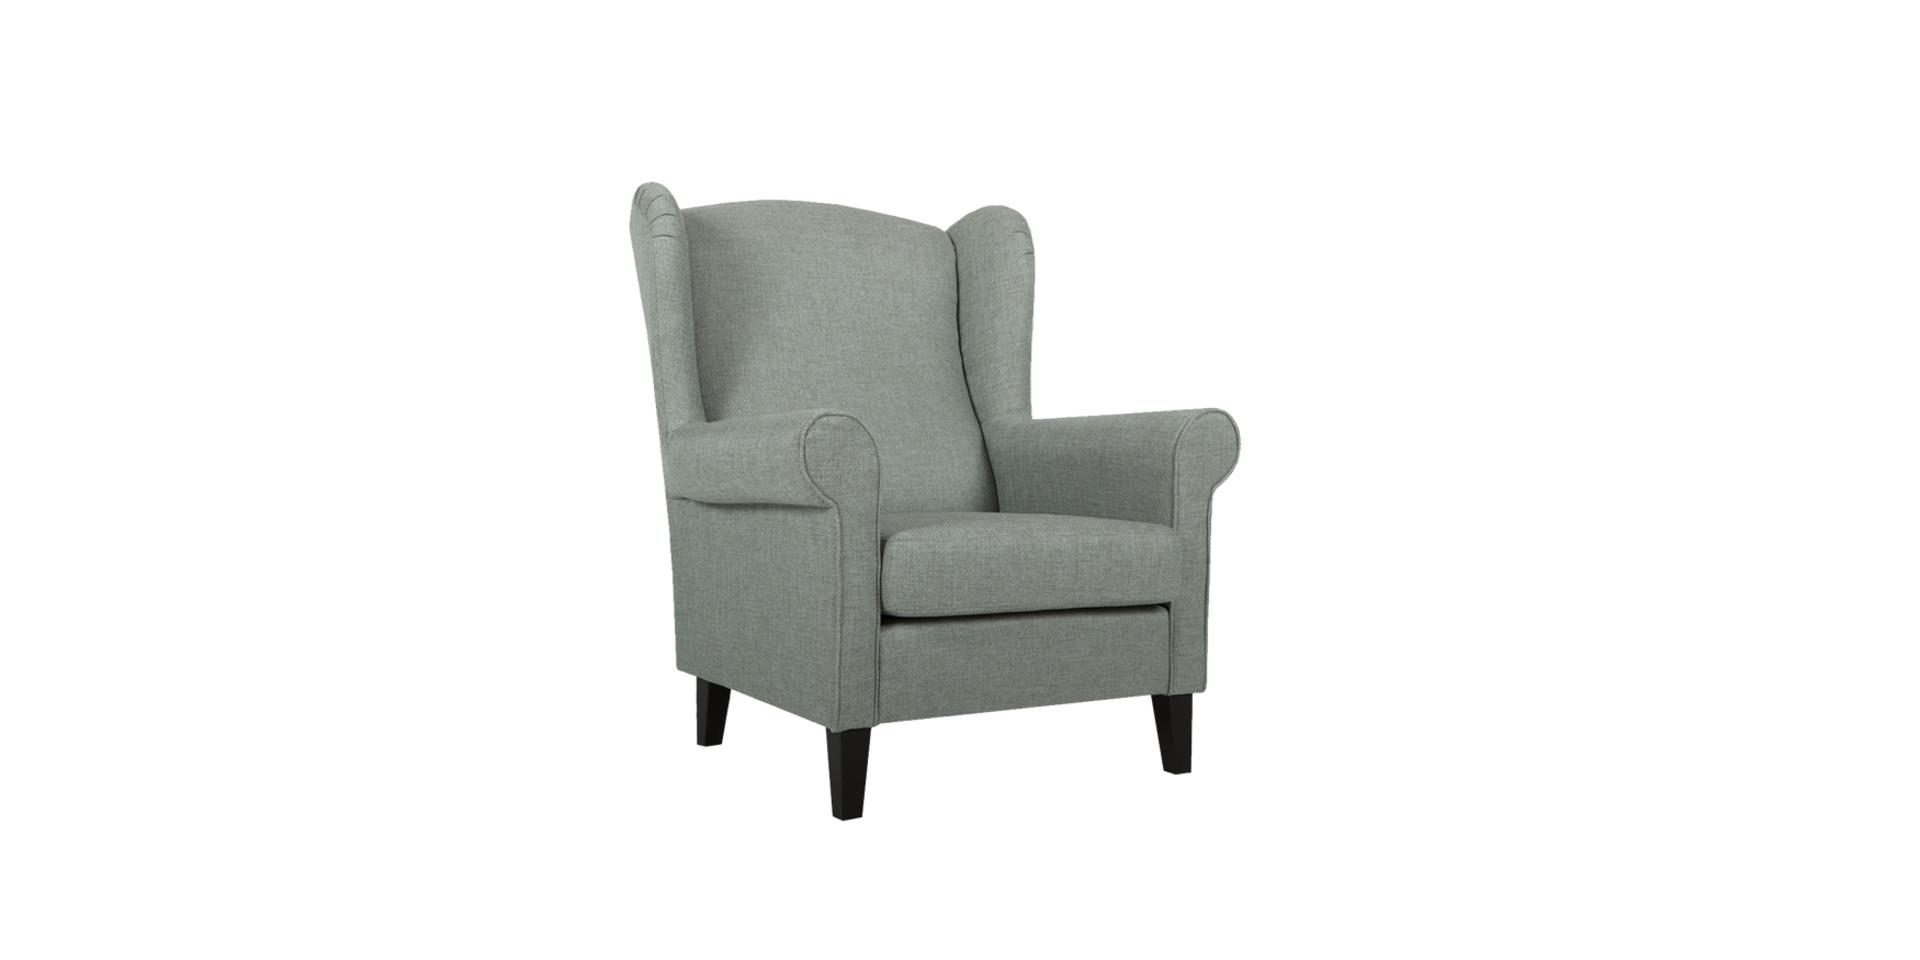 sits-watson-fauteuil-armchair_himalaya7_green_2